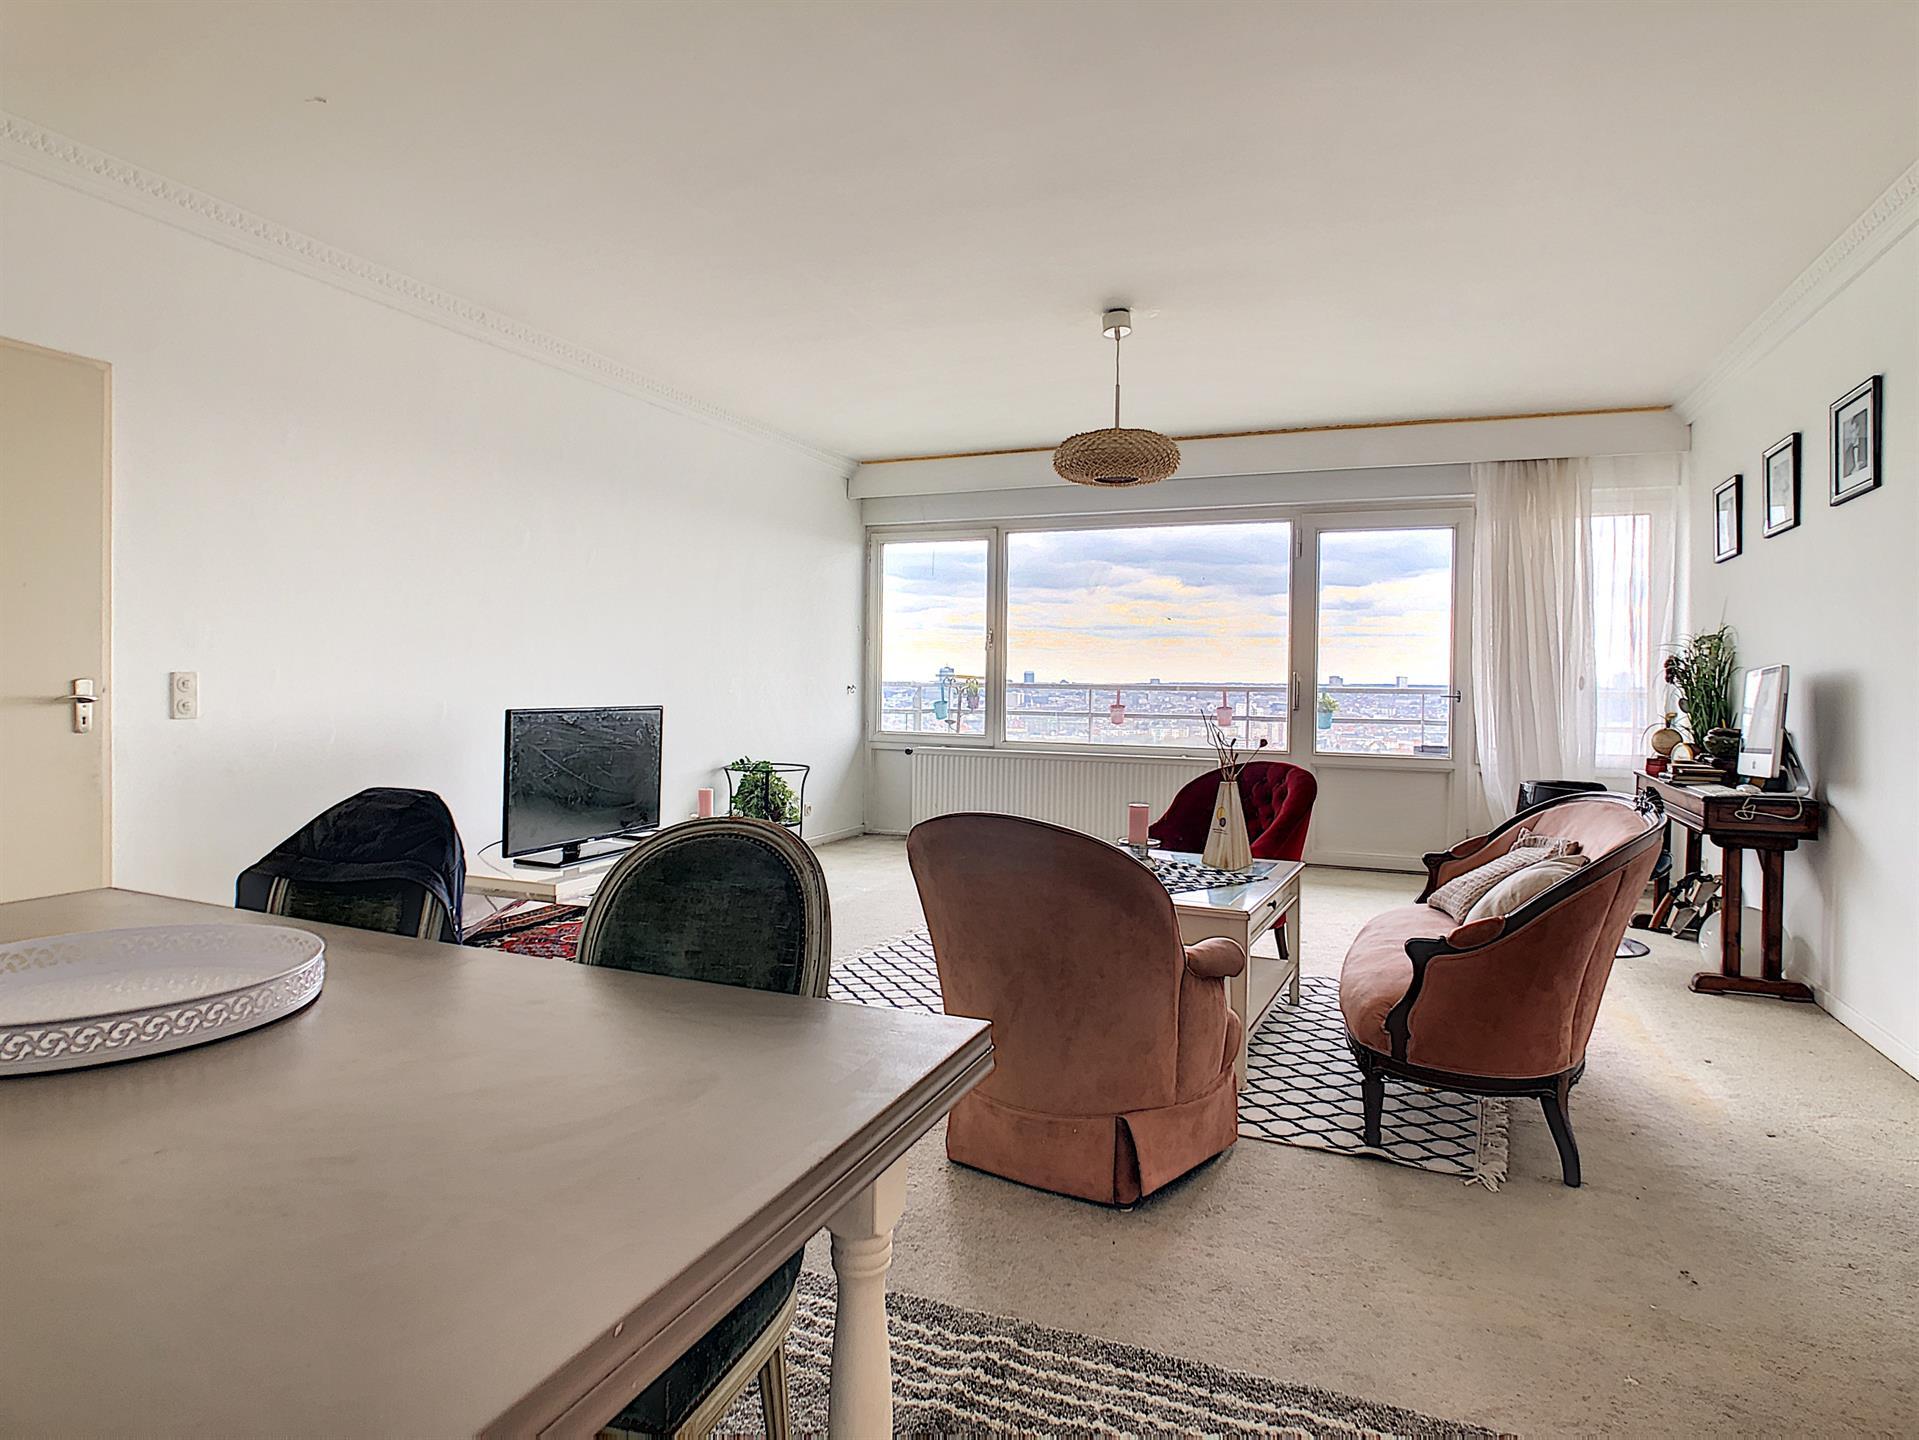 Appartement - Molenbeek-Saint-Jean - #4320527-0